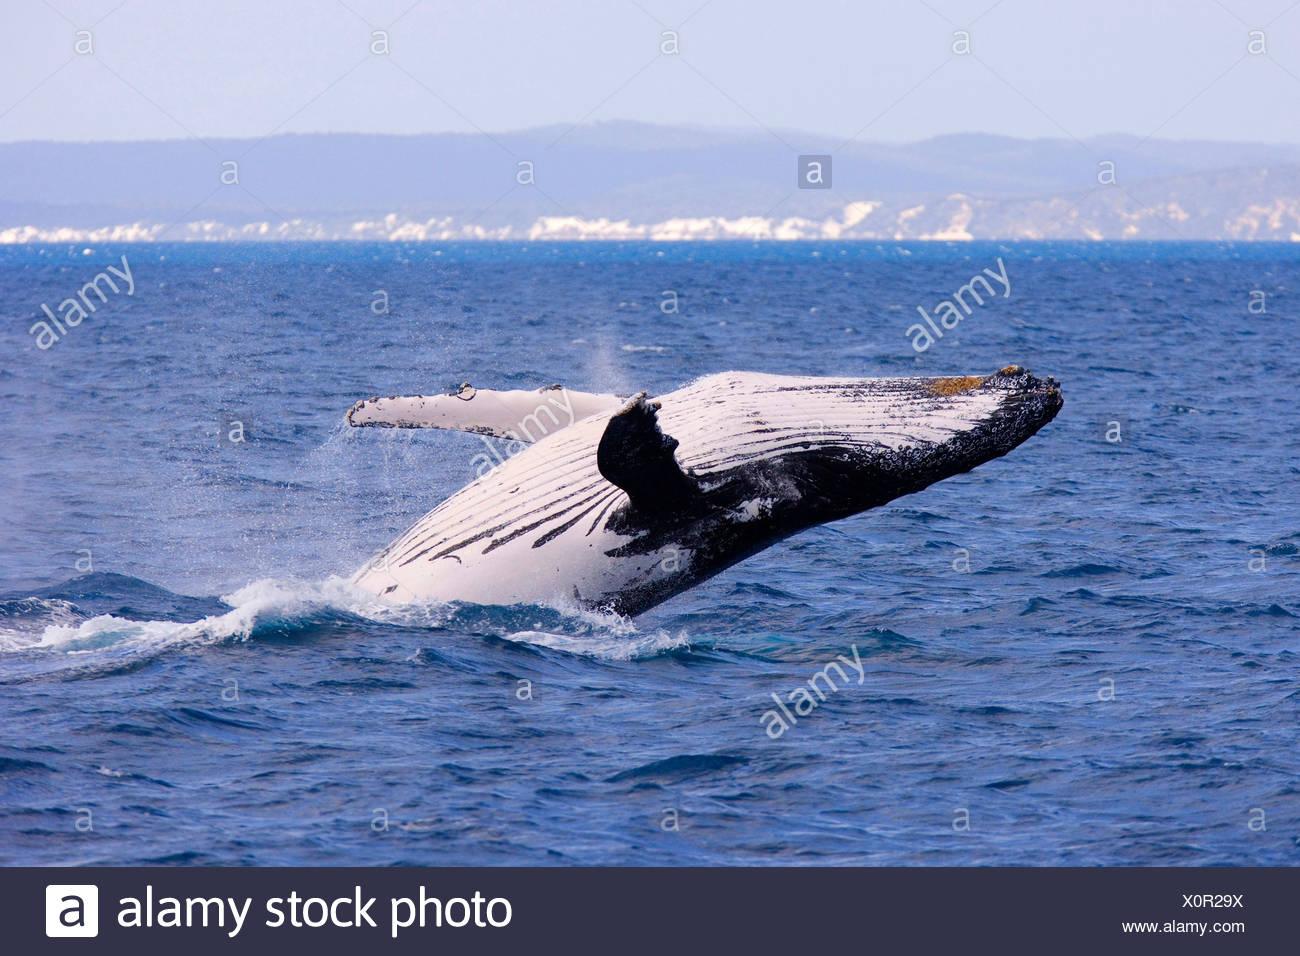 humpback whale (Megaptera novaeangliae), breaching female whale in front of Fraser Island's coast, Australia, Queensland, Hervey Bay Marine Park - Stock Image